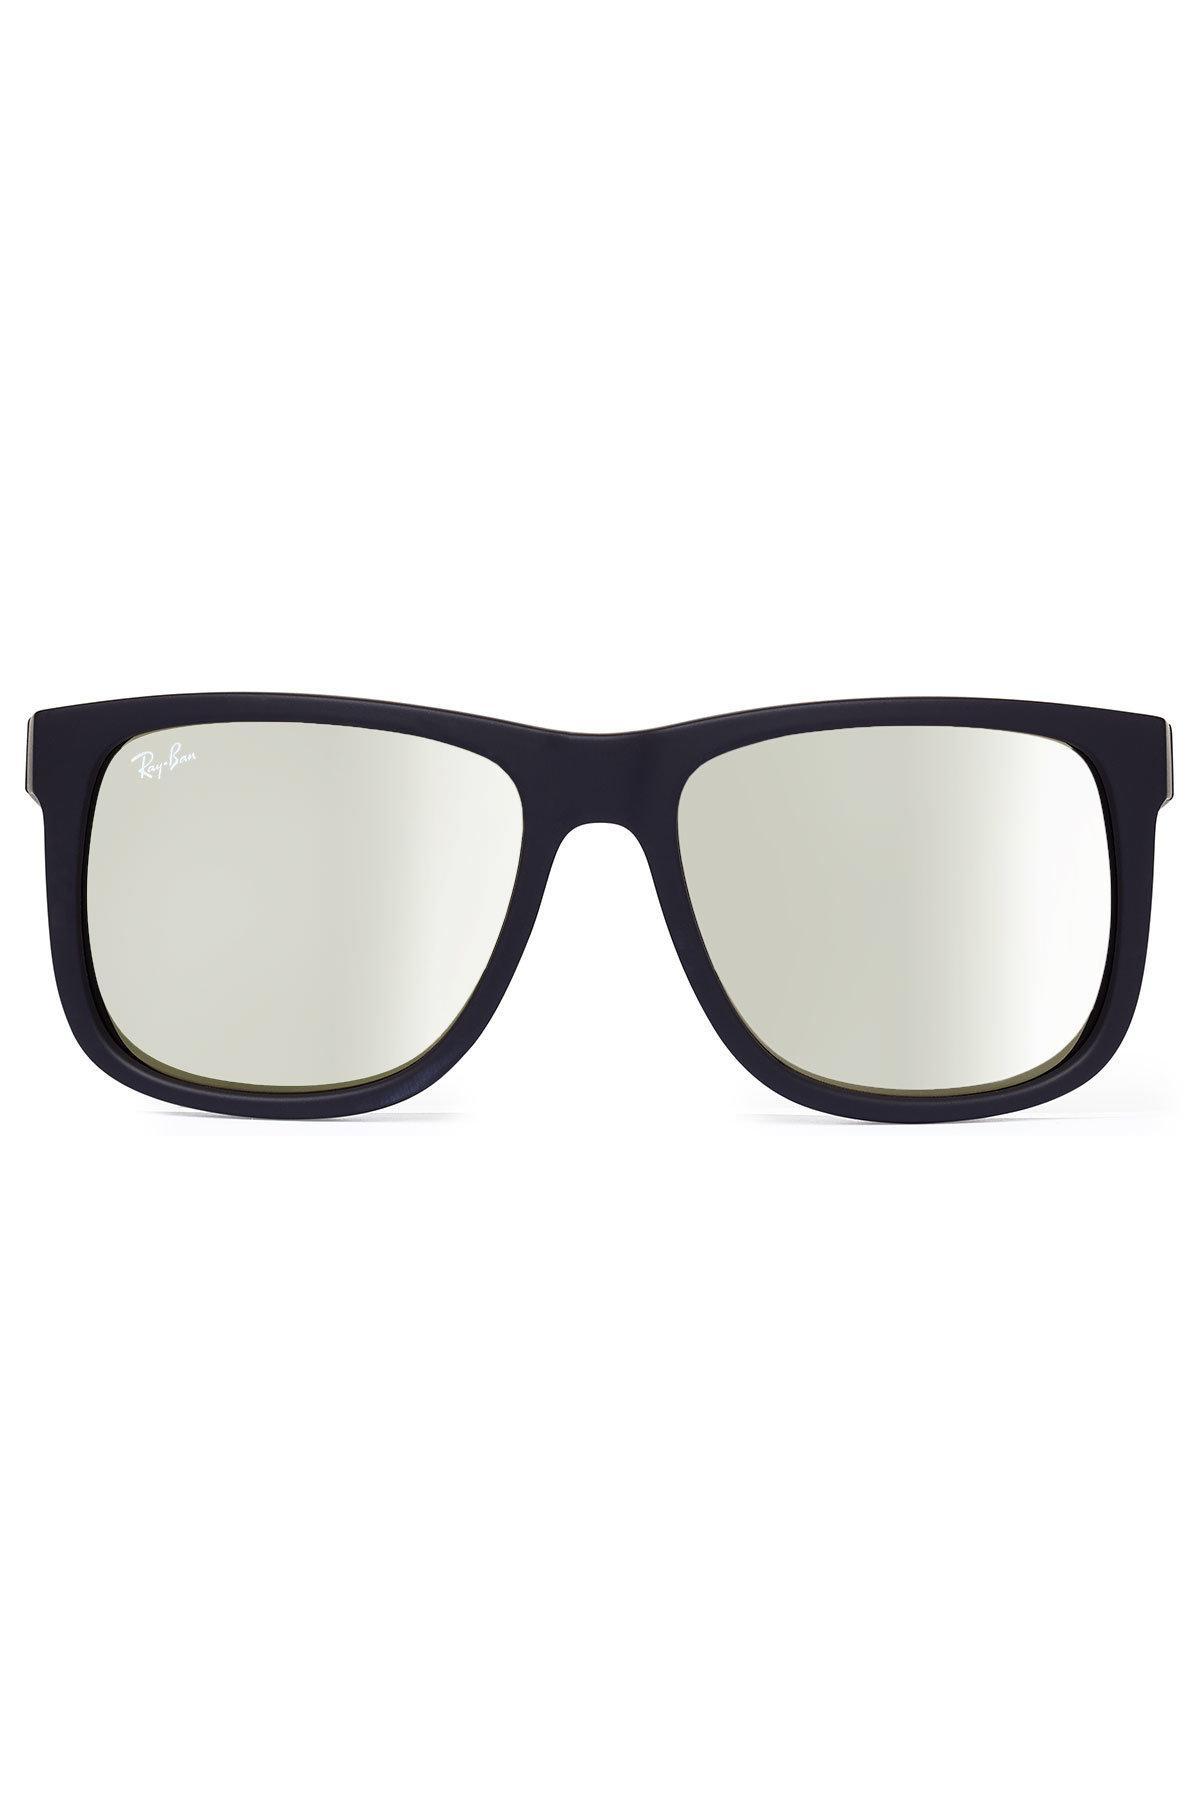 37760ede191 Ray Ban Rb4165 Justin Sunglasses Shiny Black